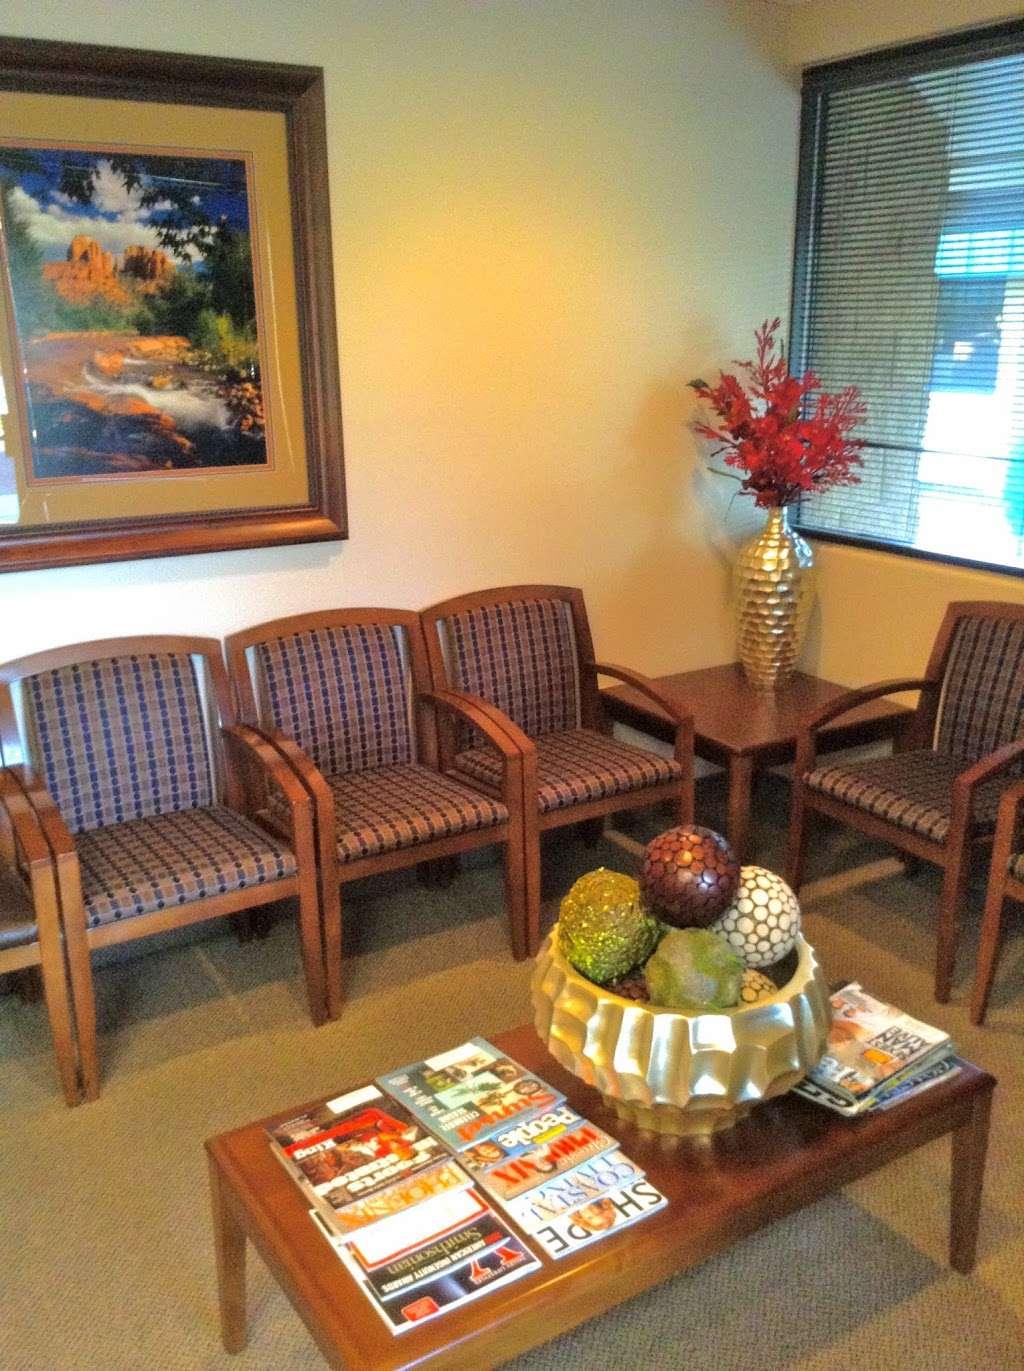 Red Rock Family Dentistry - dentist  | Photo 4 of 10 | Address: 908 W Chandler Blvd # C-7, Chandler, AZ 85225, USA | Phone: (480) 782-8111